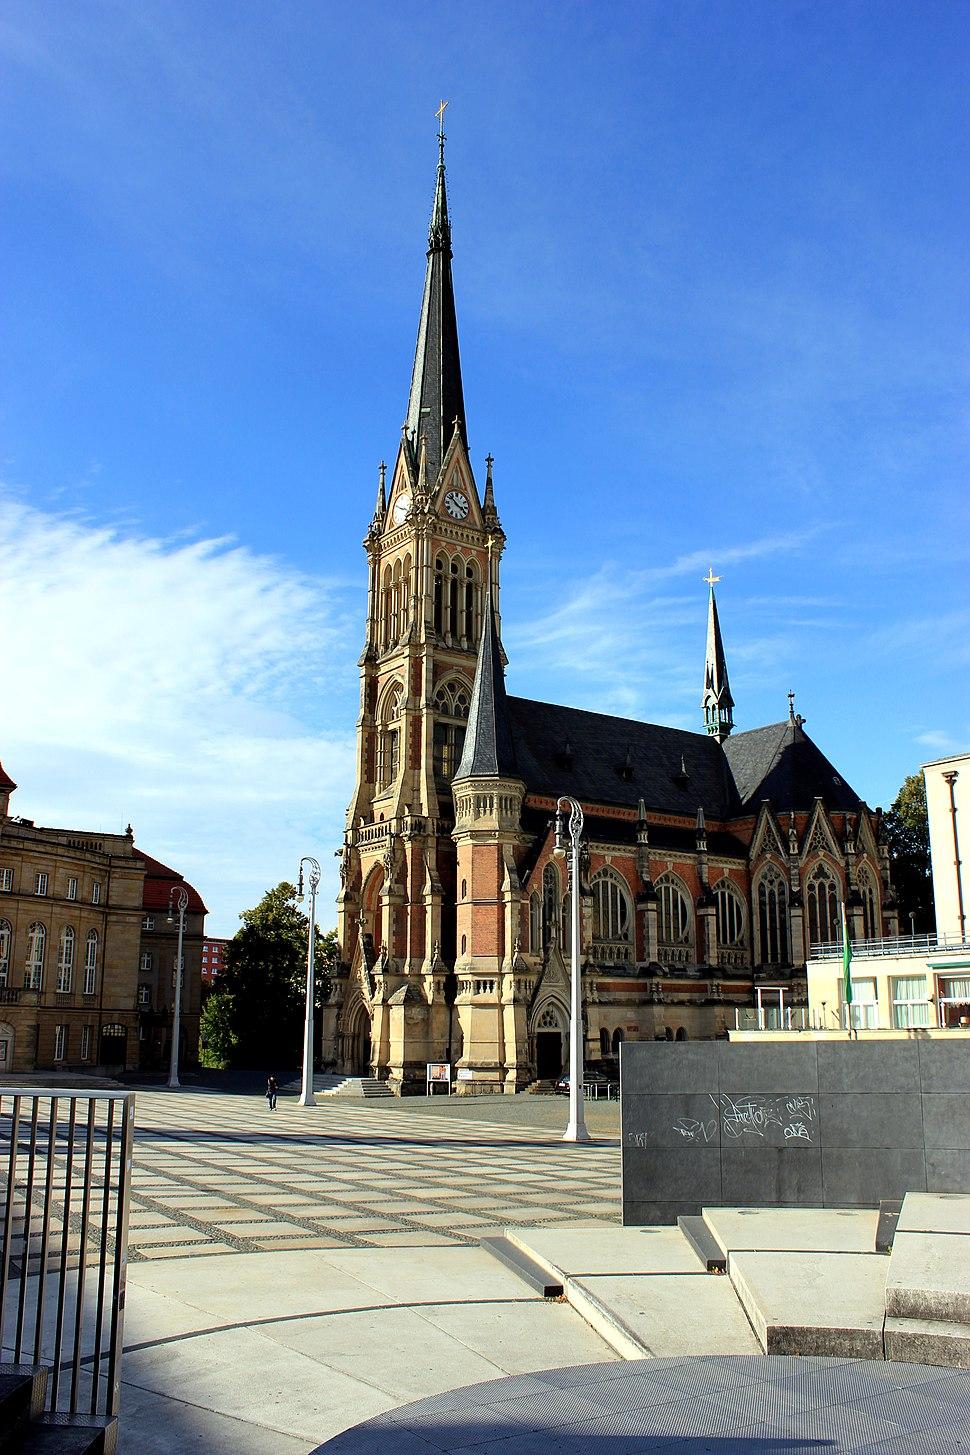 St.-Petri-Kirche in Chemnitz (Barras)